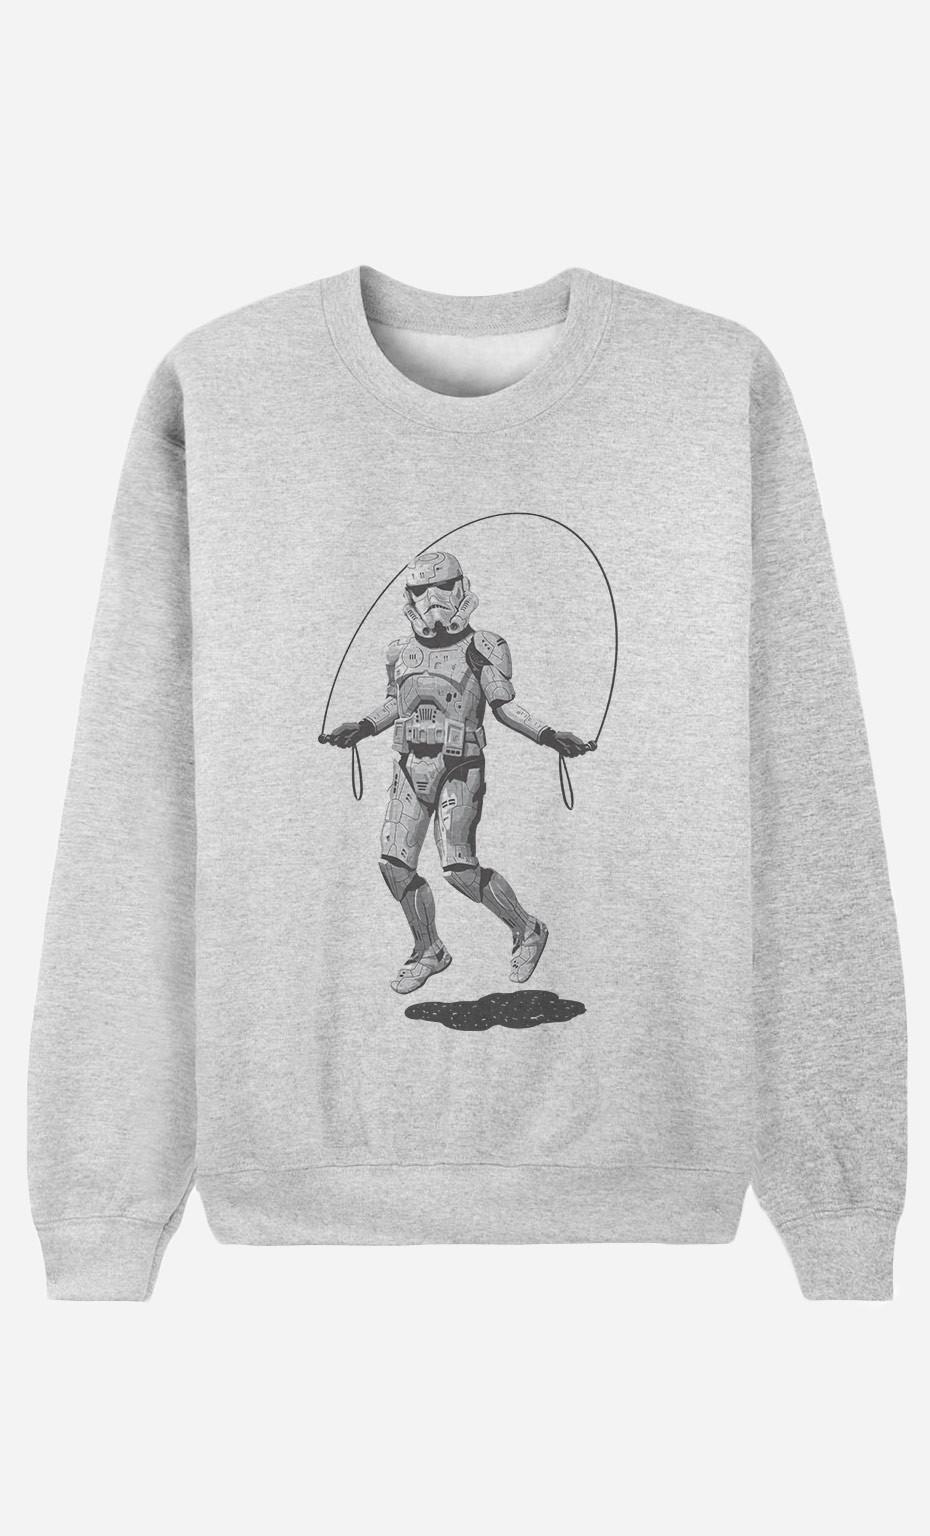 Sweatshirt Stormtrooper Skipping